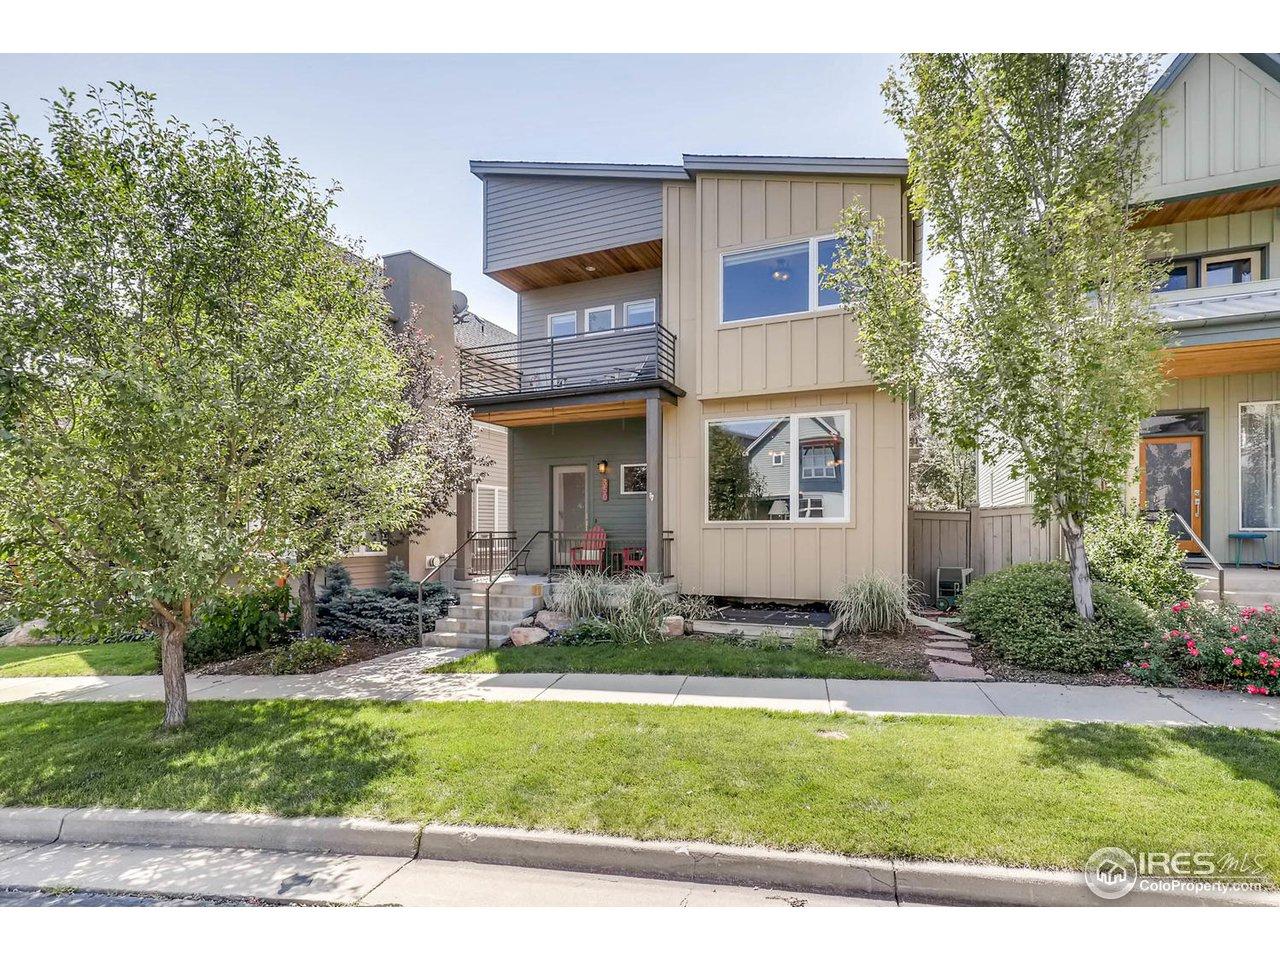 350 Laramie Blvd, Boulder CO 80304